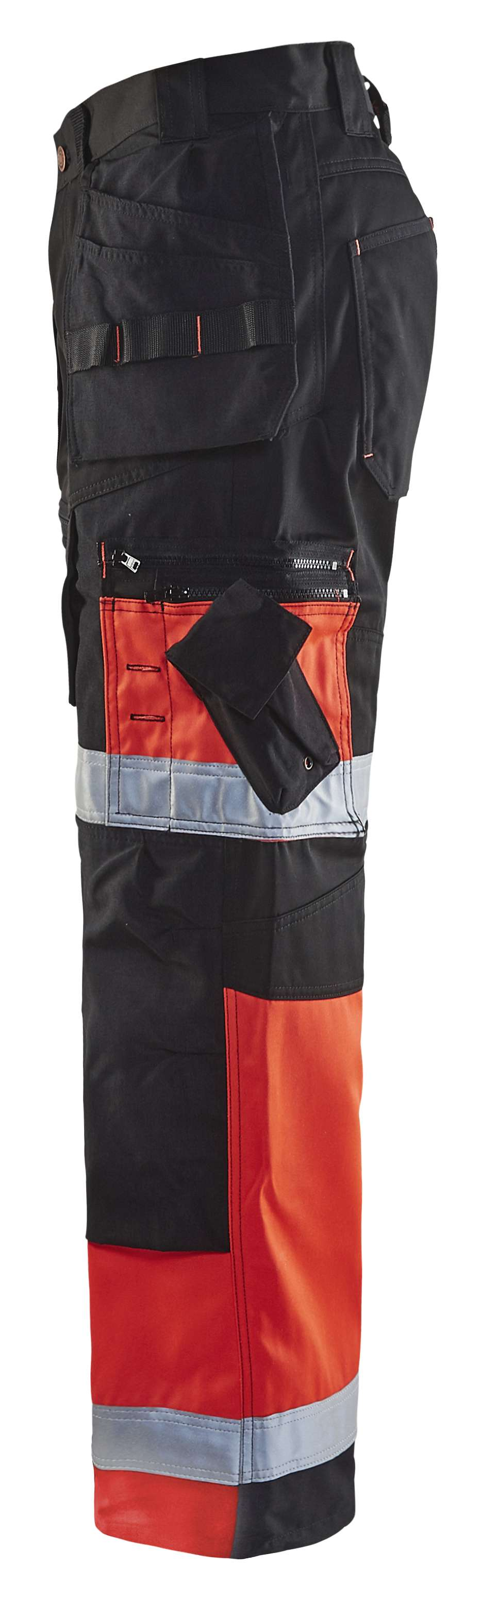 Blaklader Werkbroeken 15081860 High Vis zwart-fluo rood(9955)